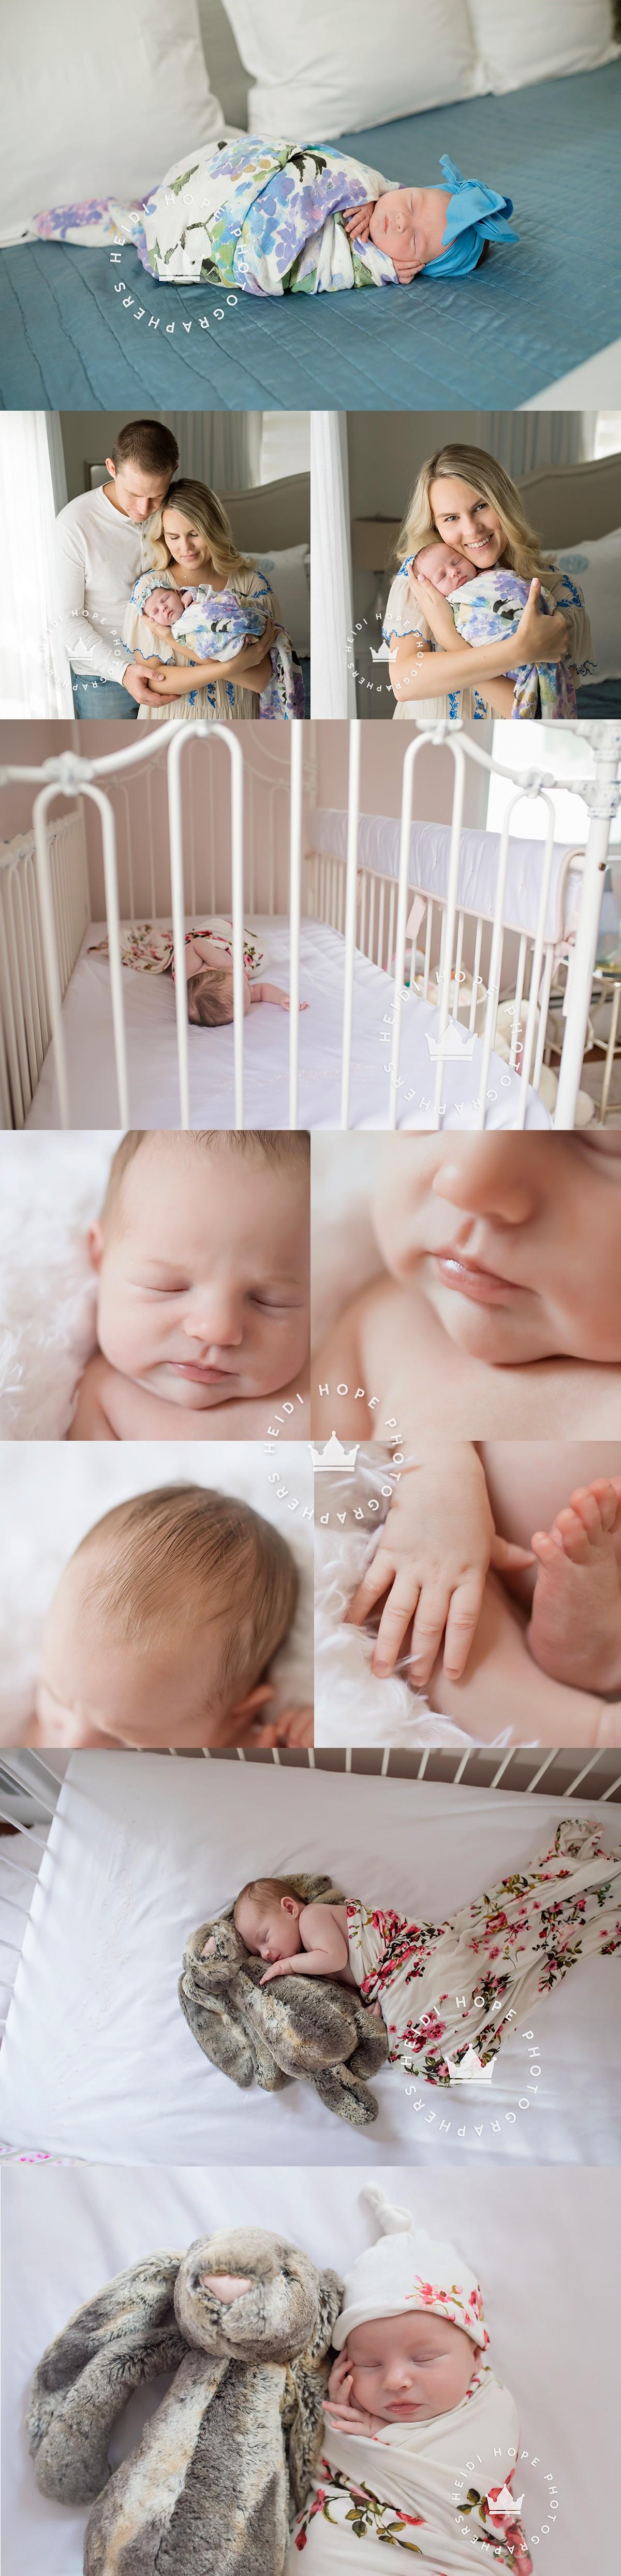 rhode island newborn photographer